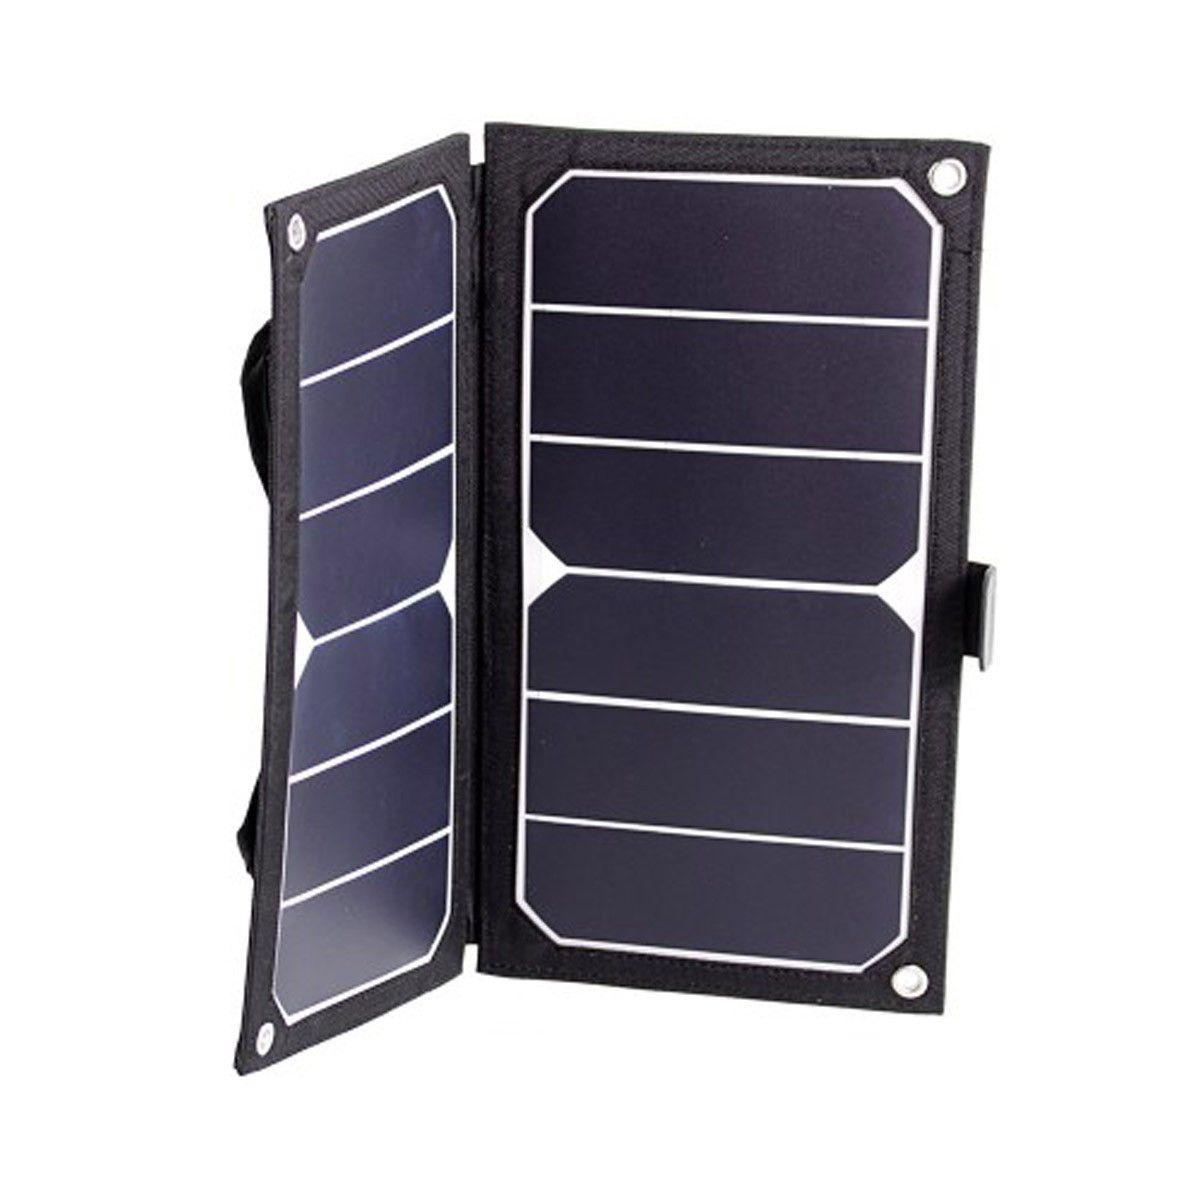 chargeur solaire pliable 12w. Black Bedroom Furniture Sets. Home Design Ideas